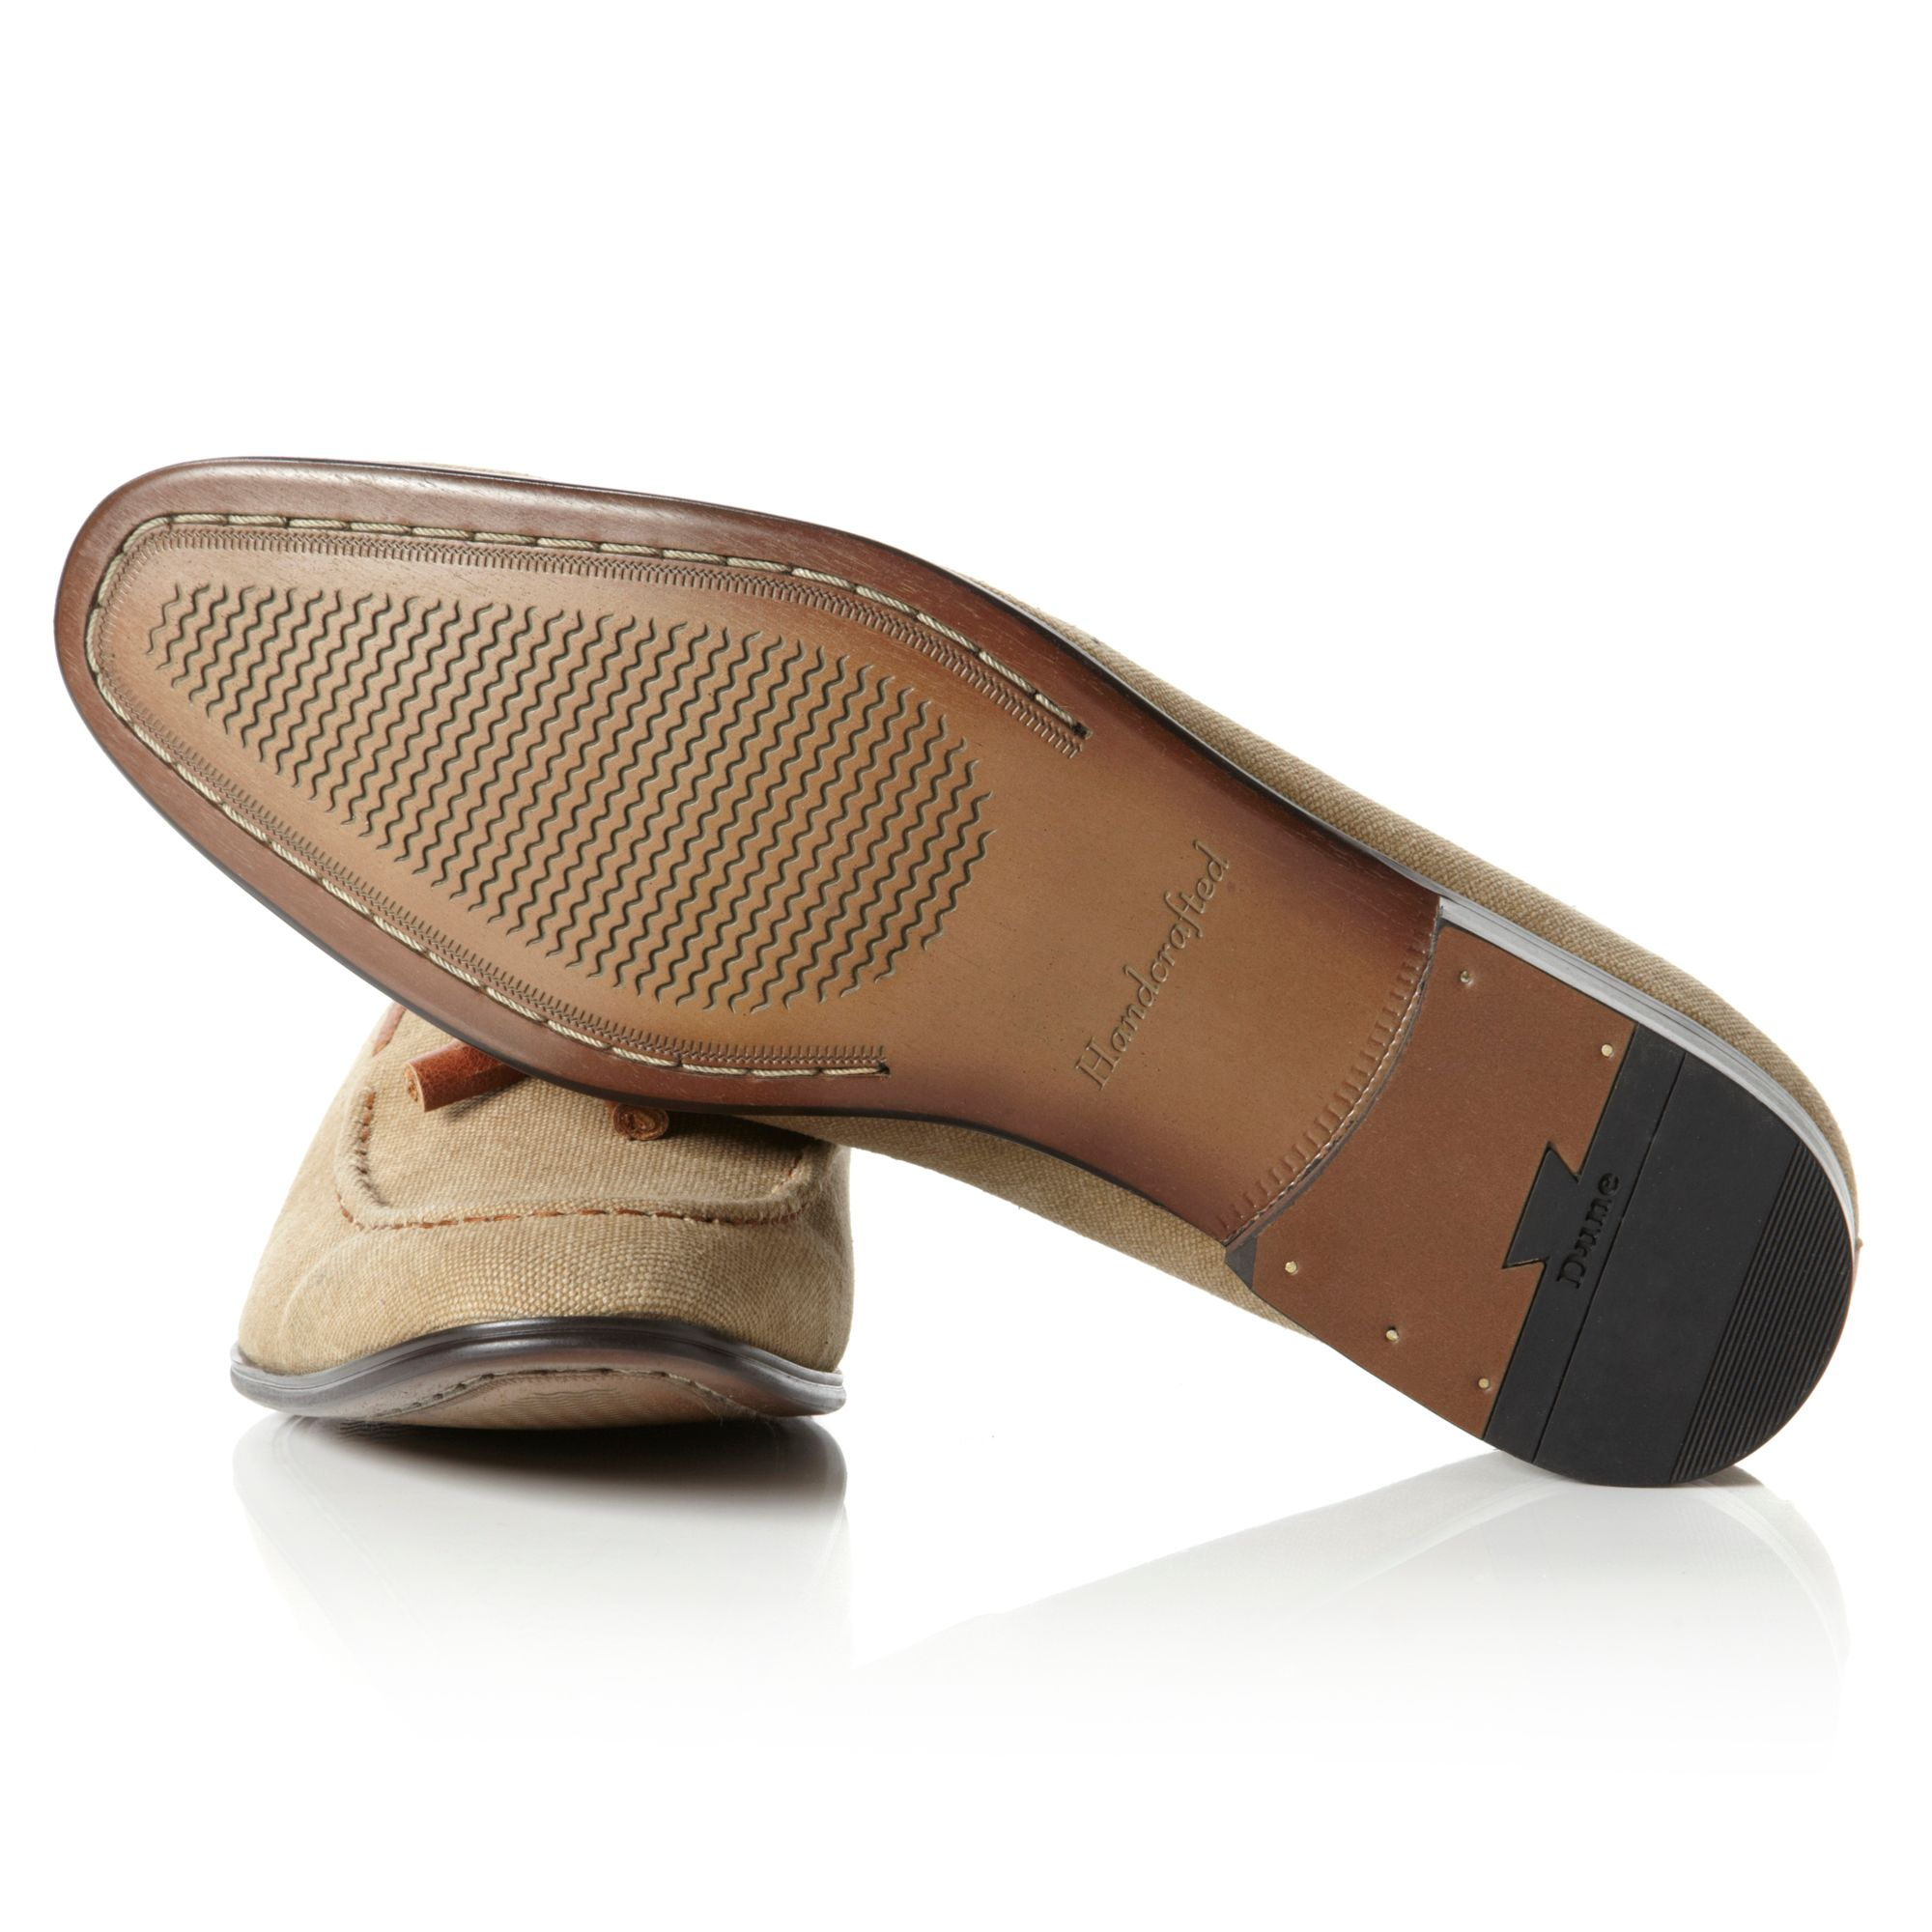 Dune Apparel Canvas Tassel Loafers in Beige (Natural) for Men